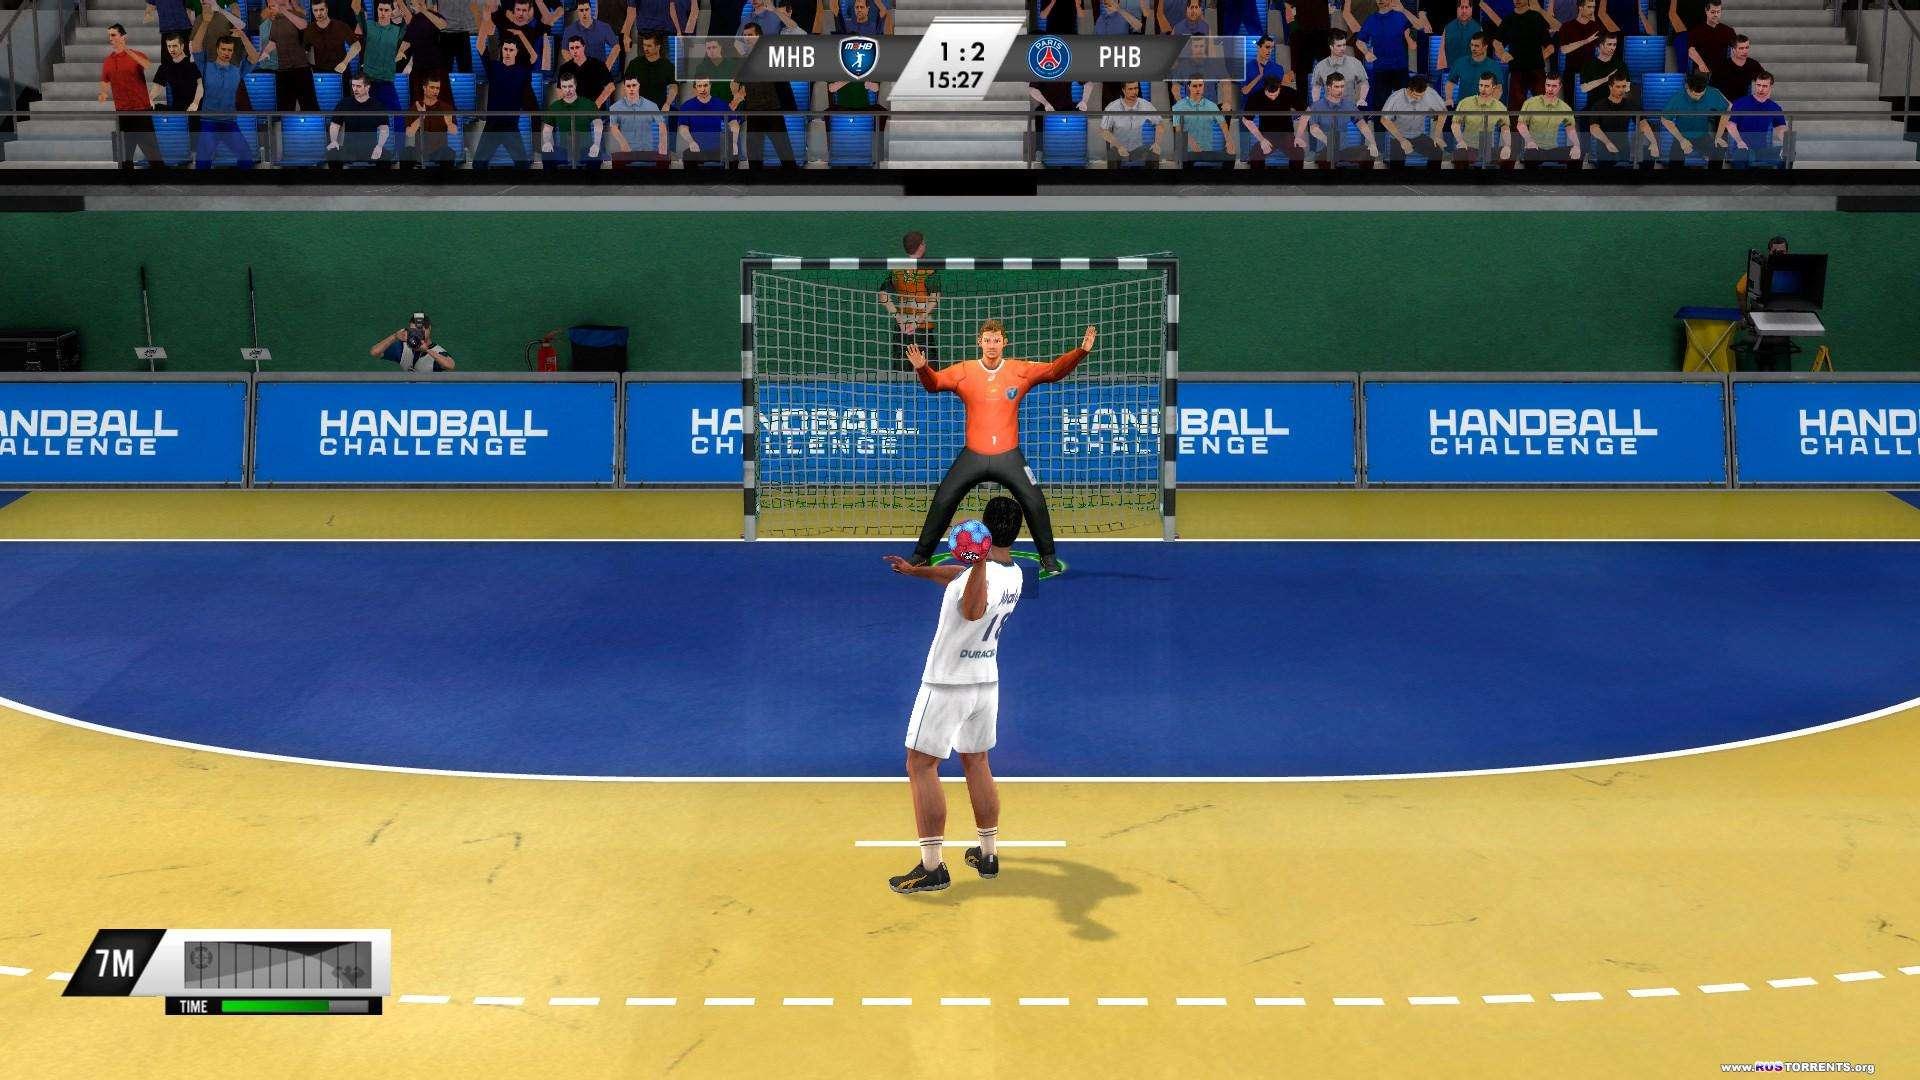 IHF Handball Challenge 14 (v.13.0) | PC | RePack by XLASER